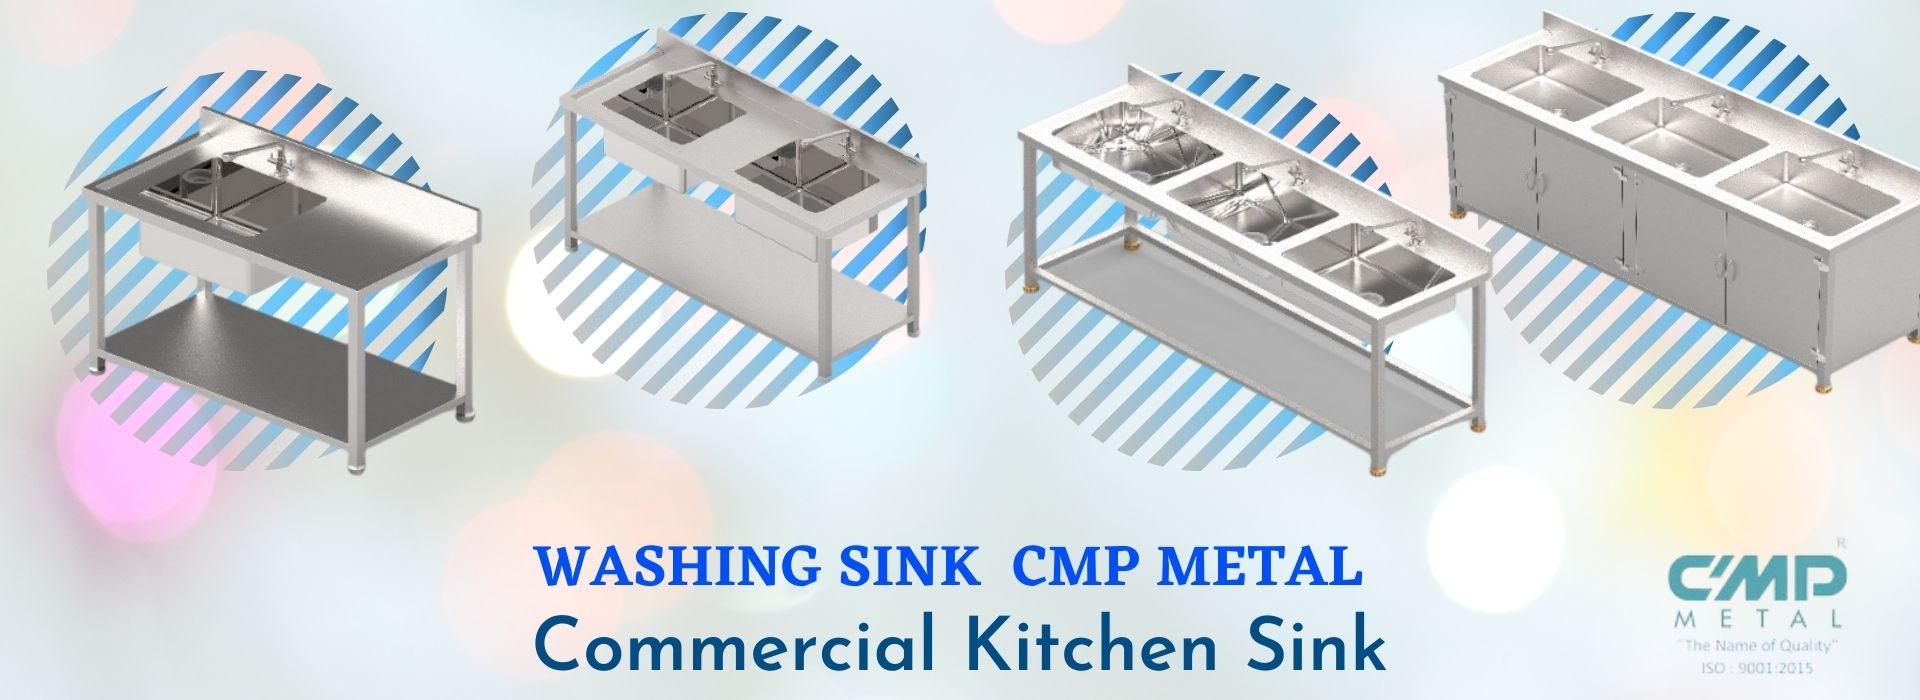 Washing Sink Cmp Metal Commercial Kitchen Sink